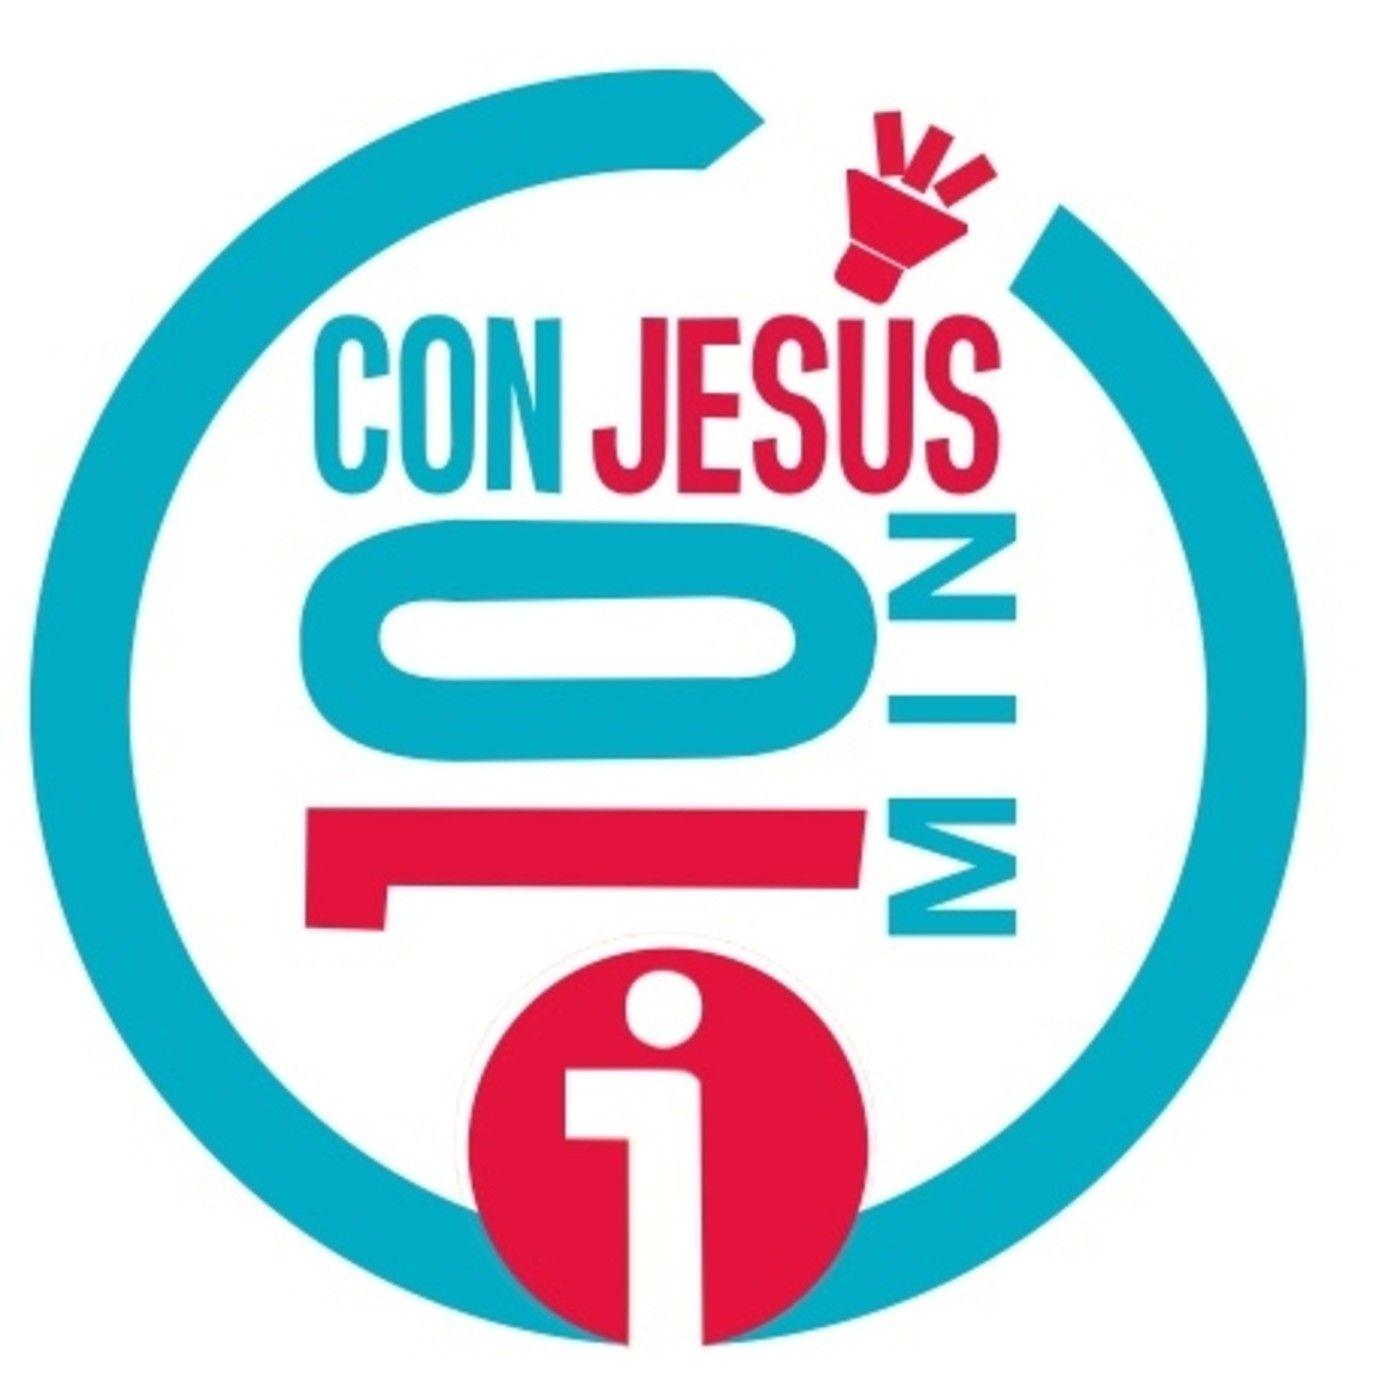 03-06-2020 África - 10 Minutos con Jesús